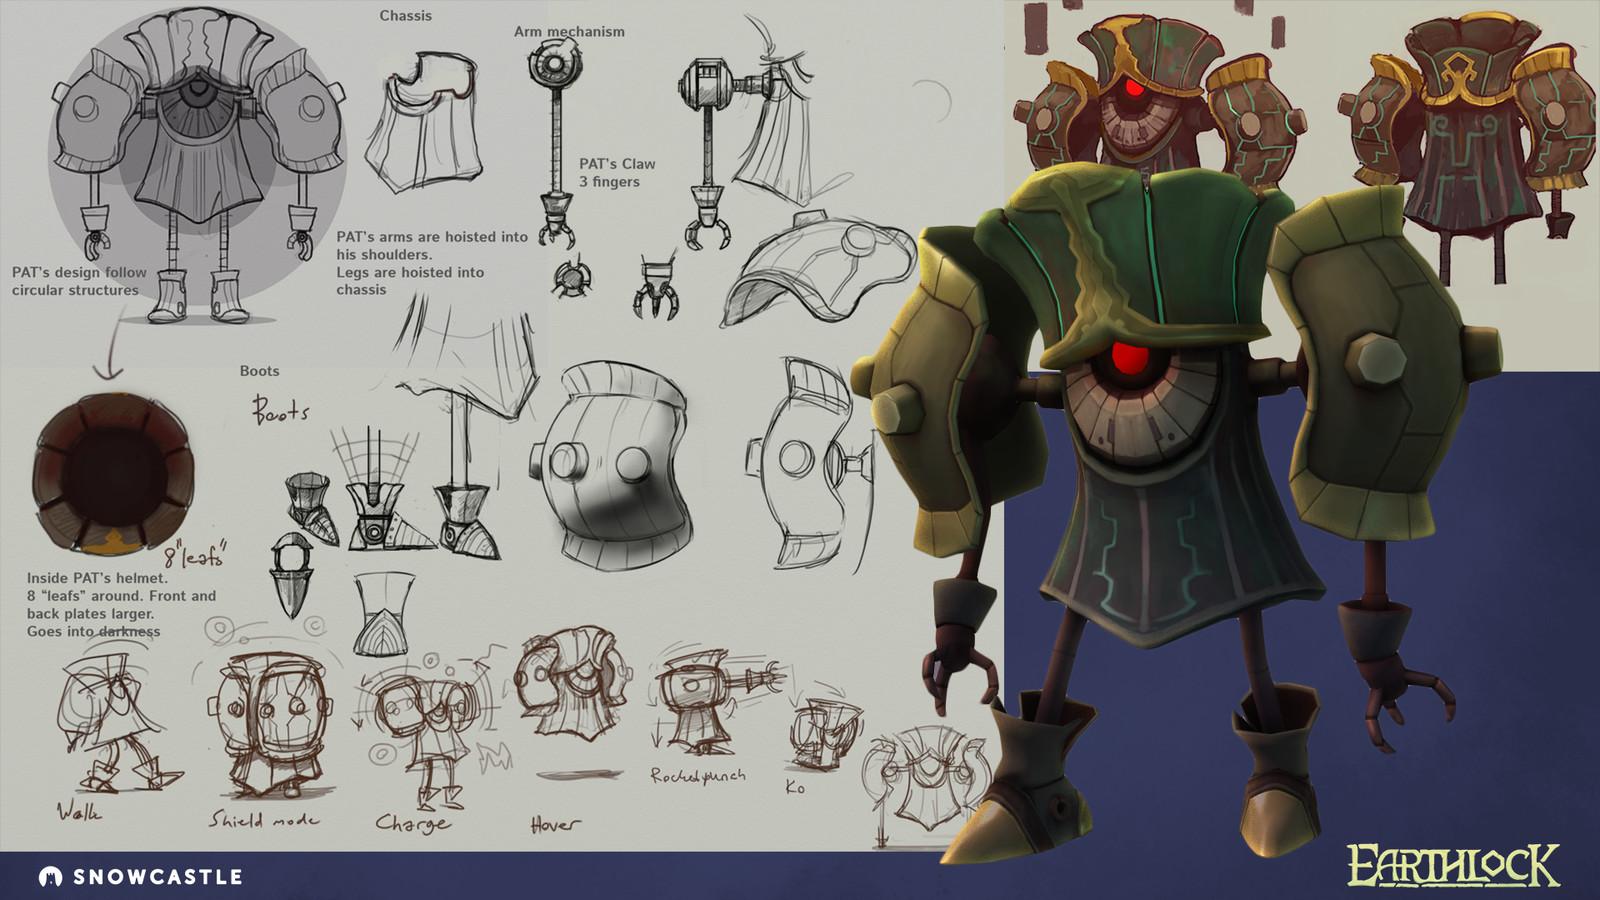 The original PAT design and sketches.